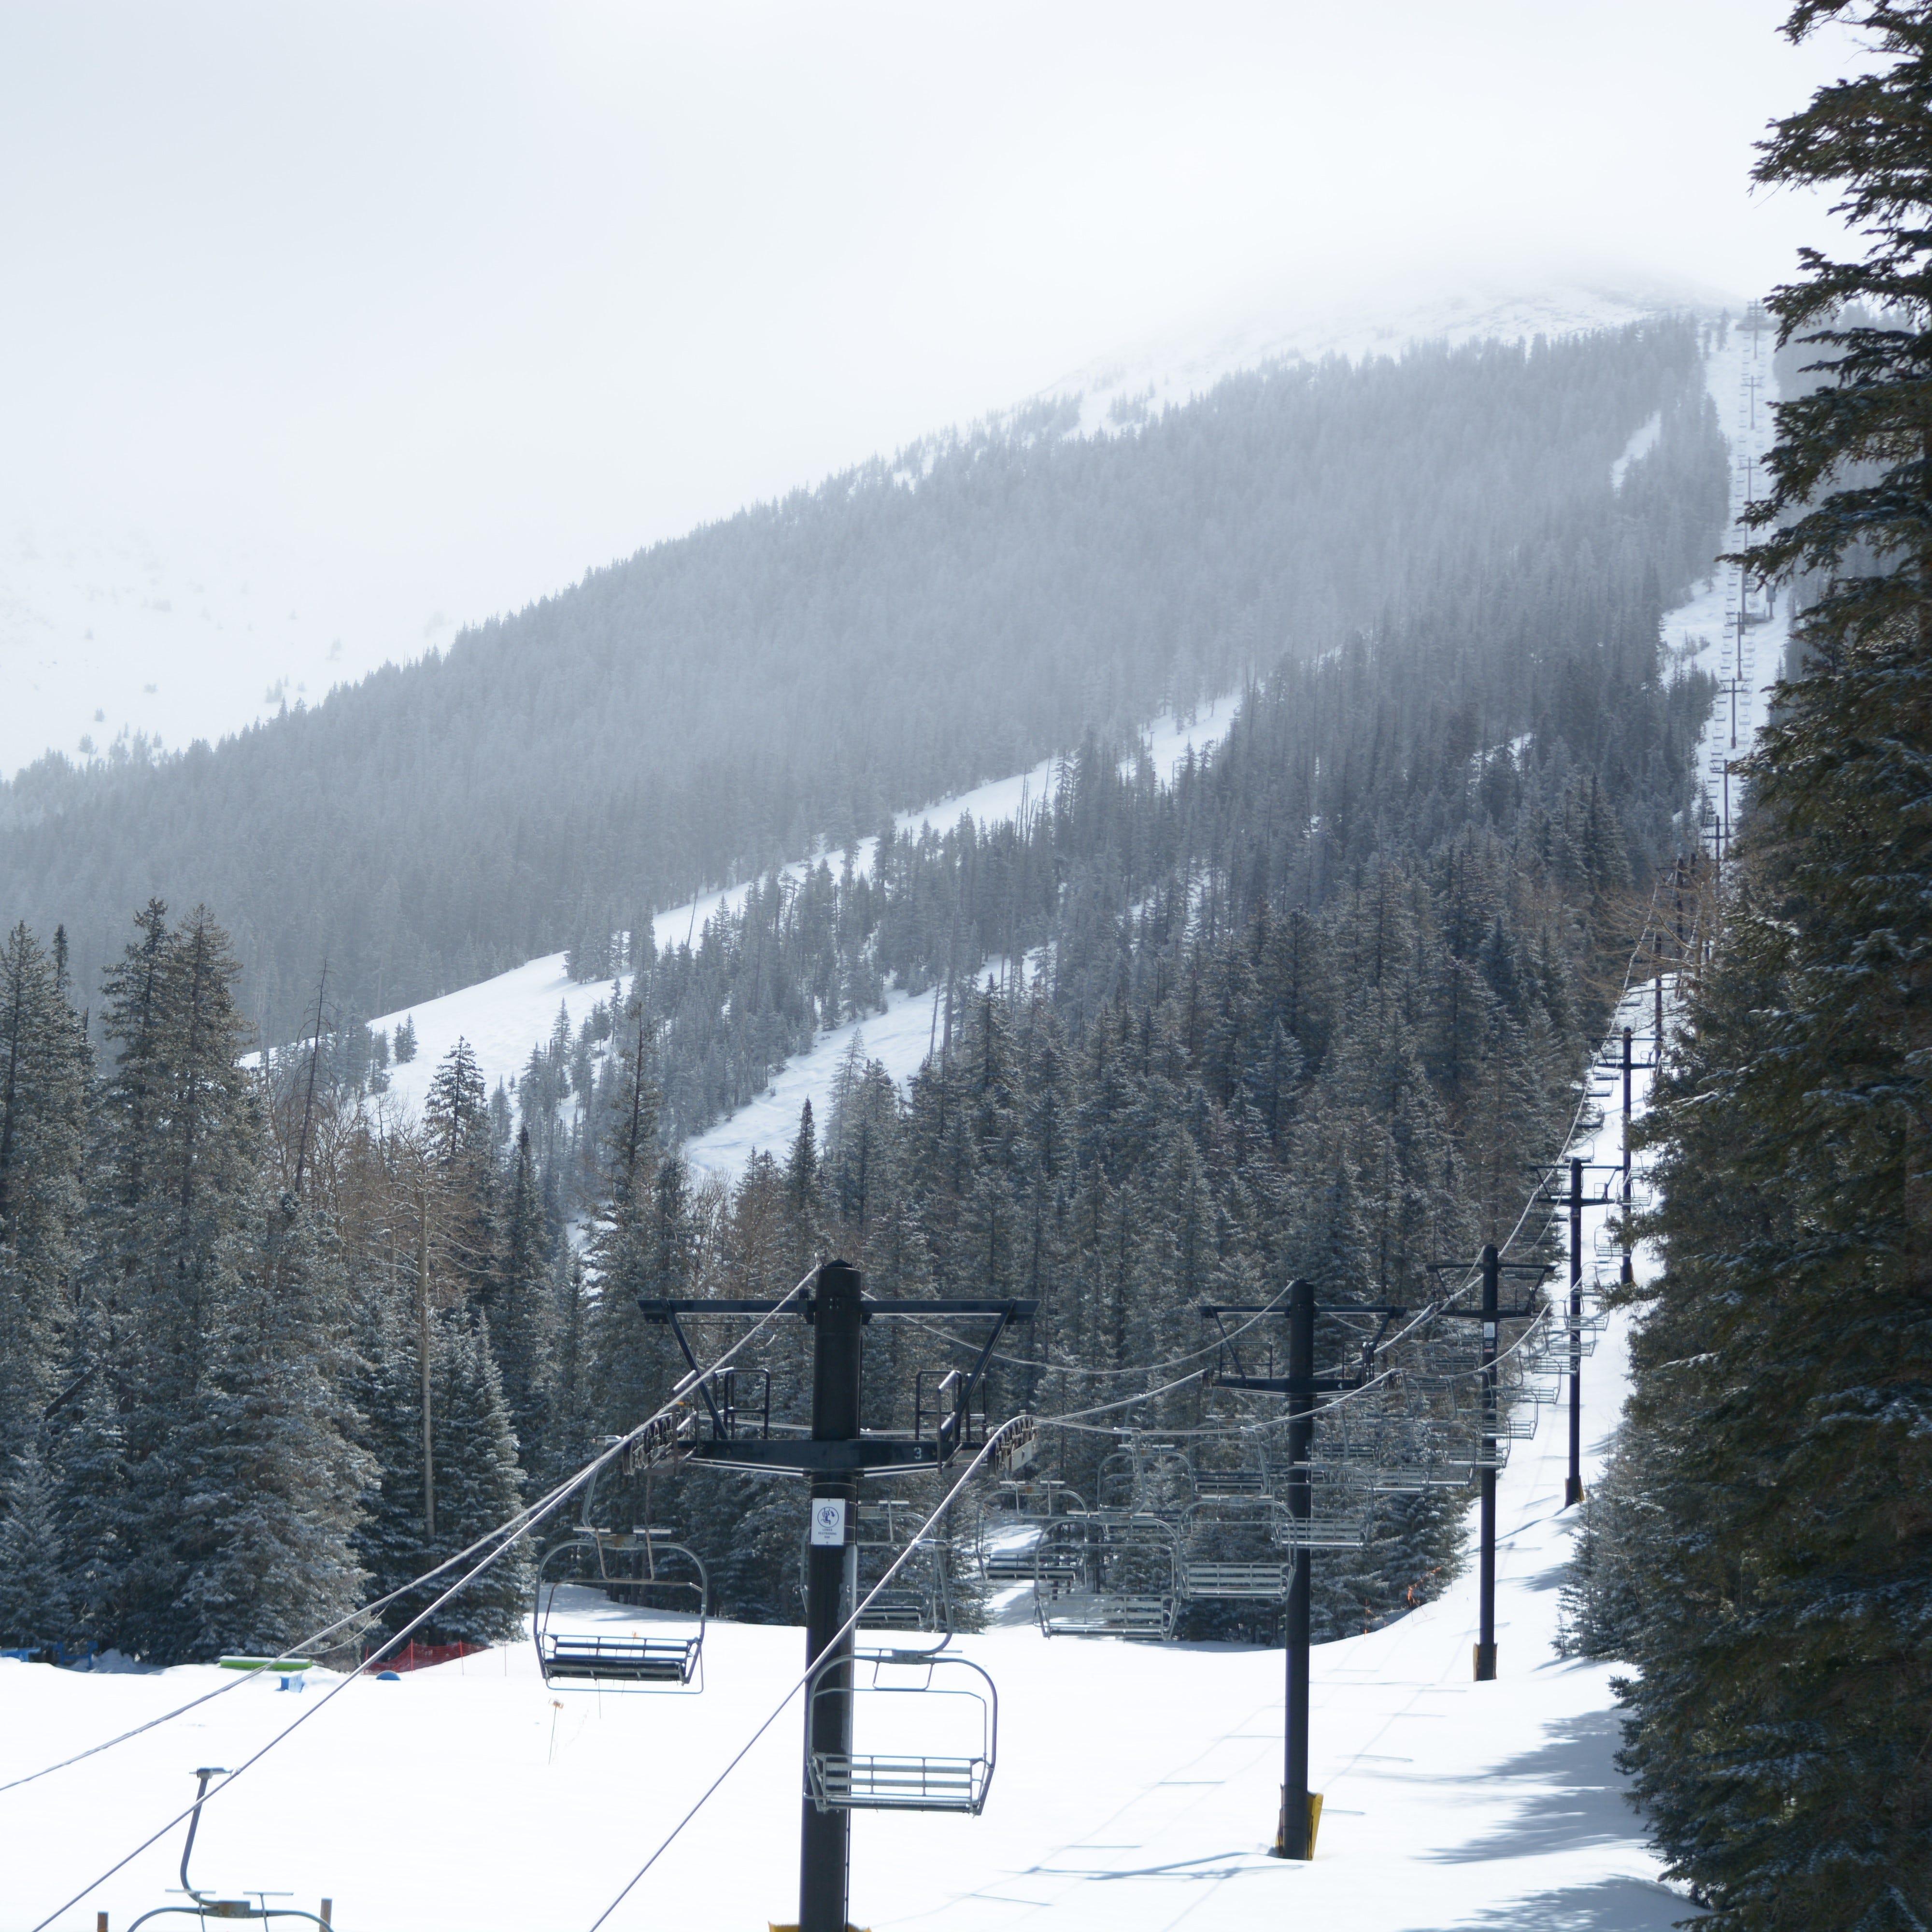 Arizona Snowbowl ski resort planning to stay open